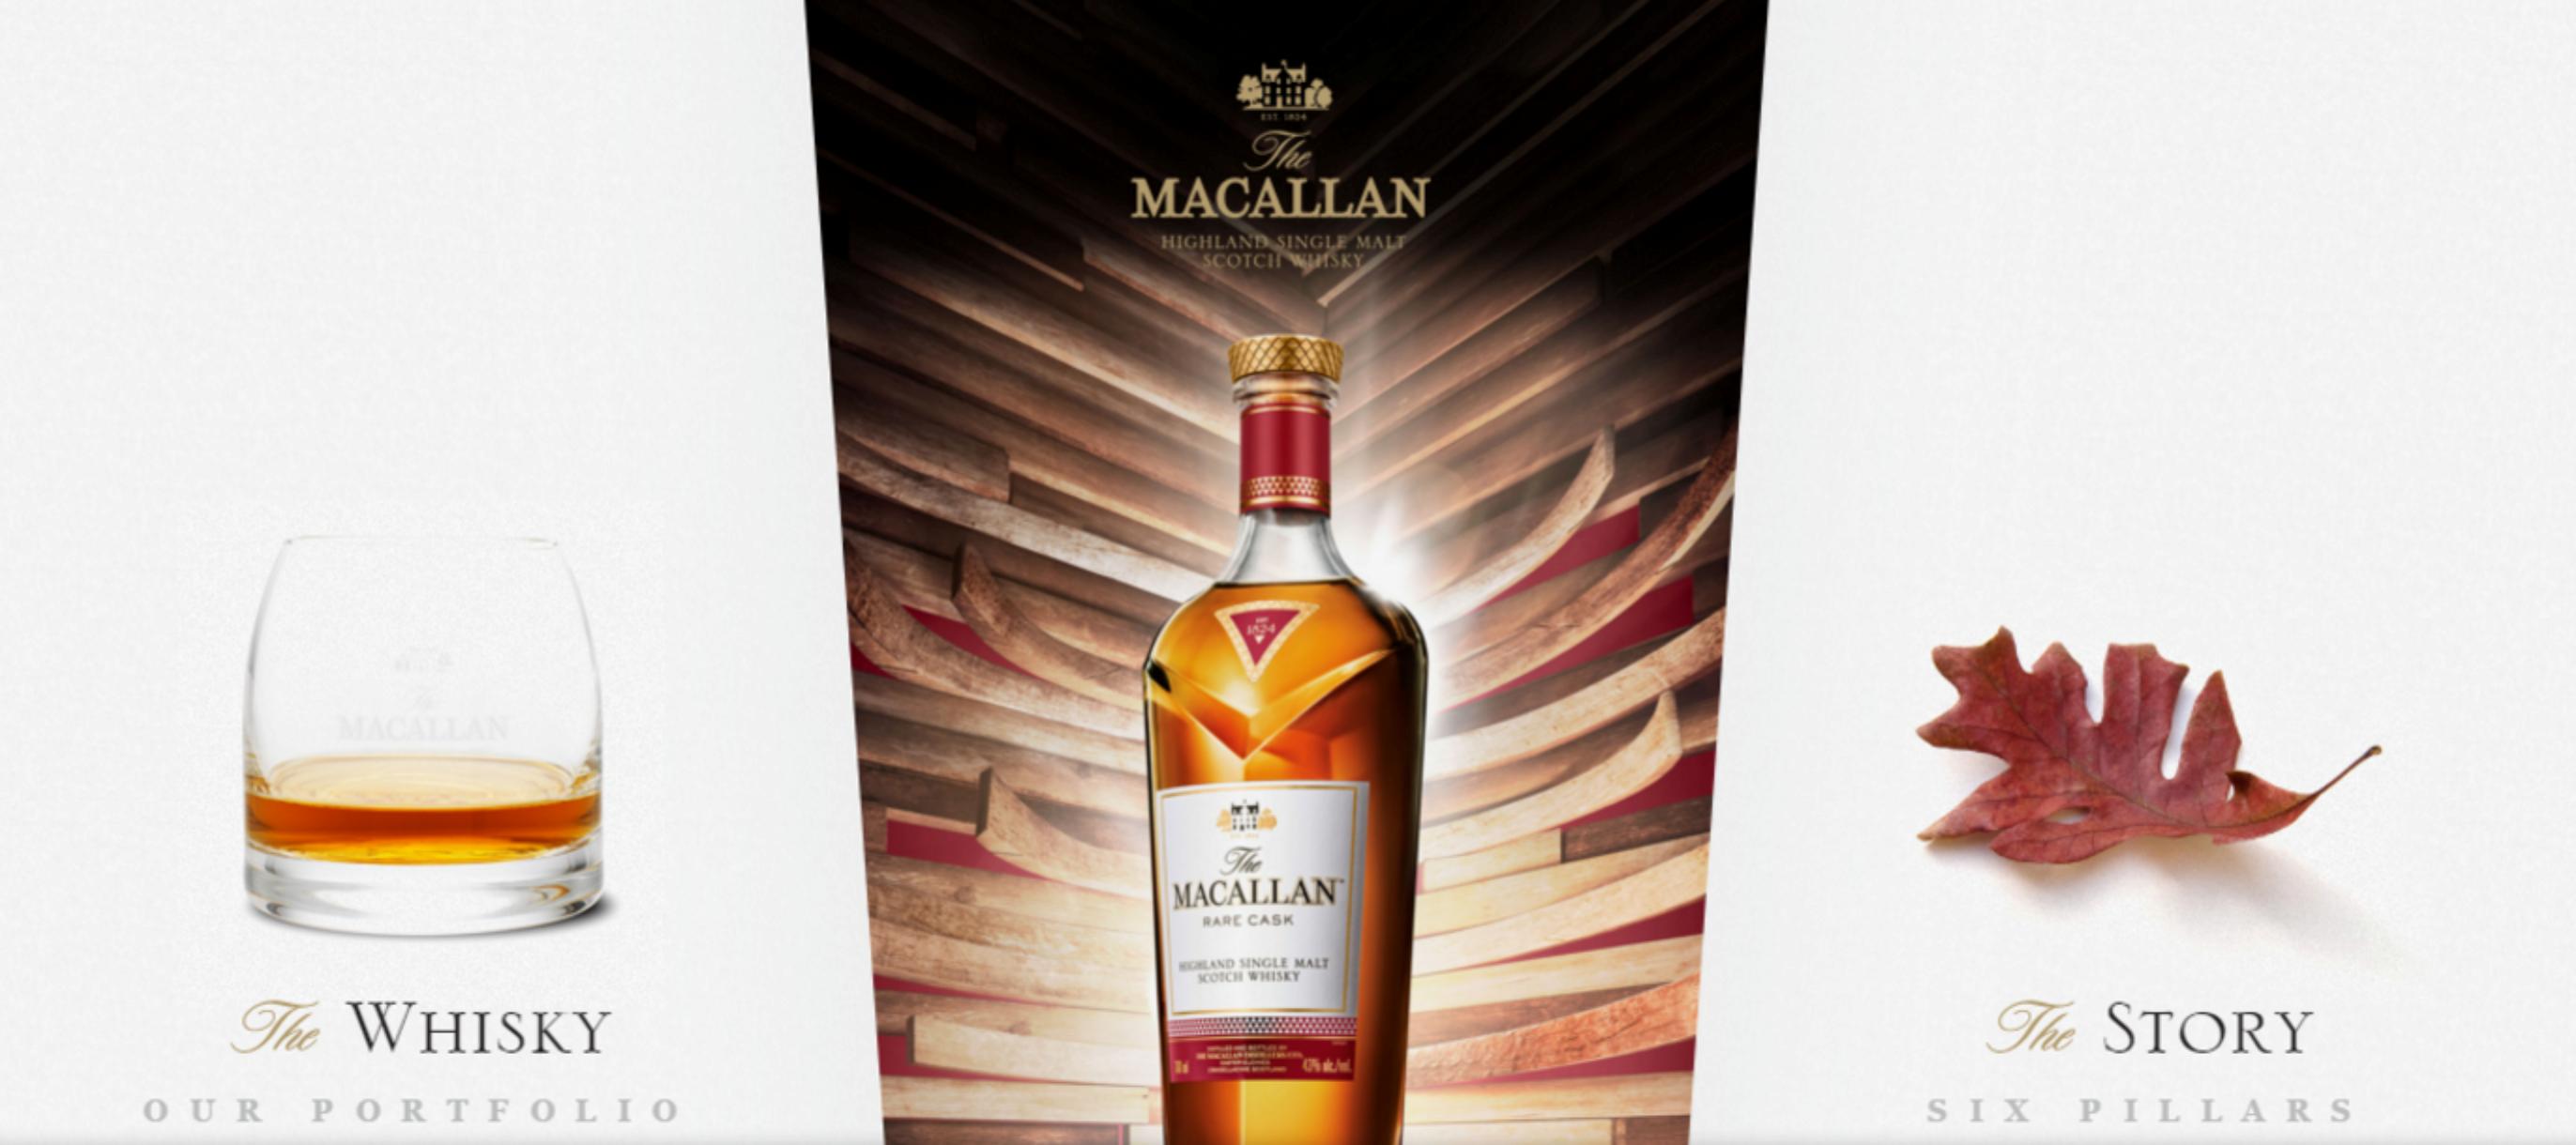 macallan-whisky-marketing-impulse.png